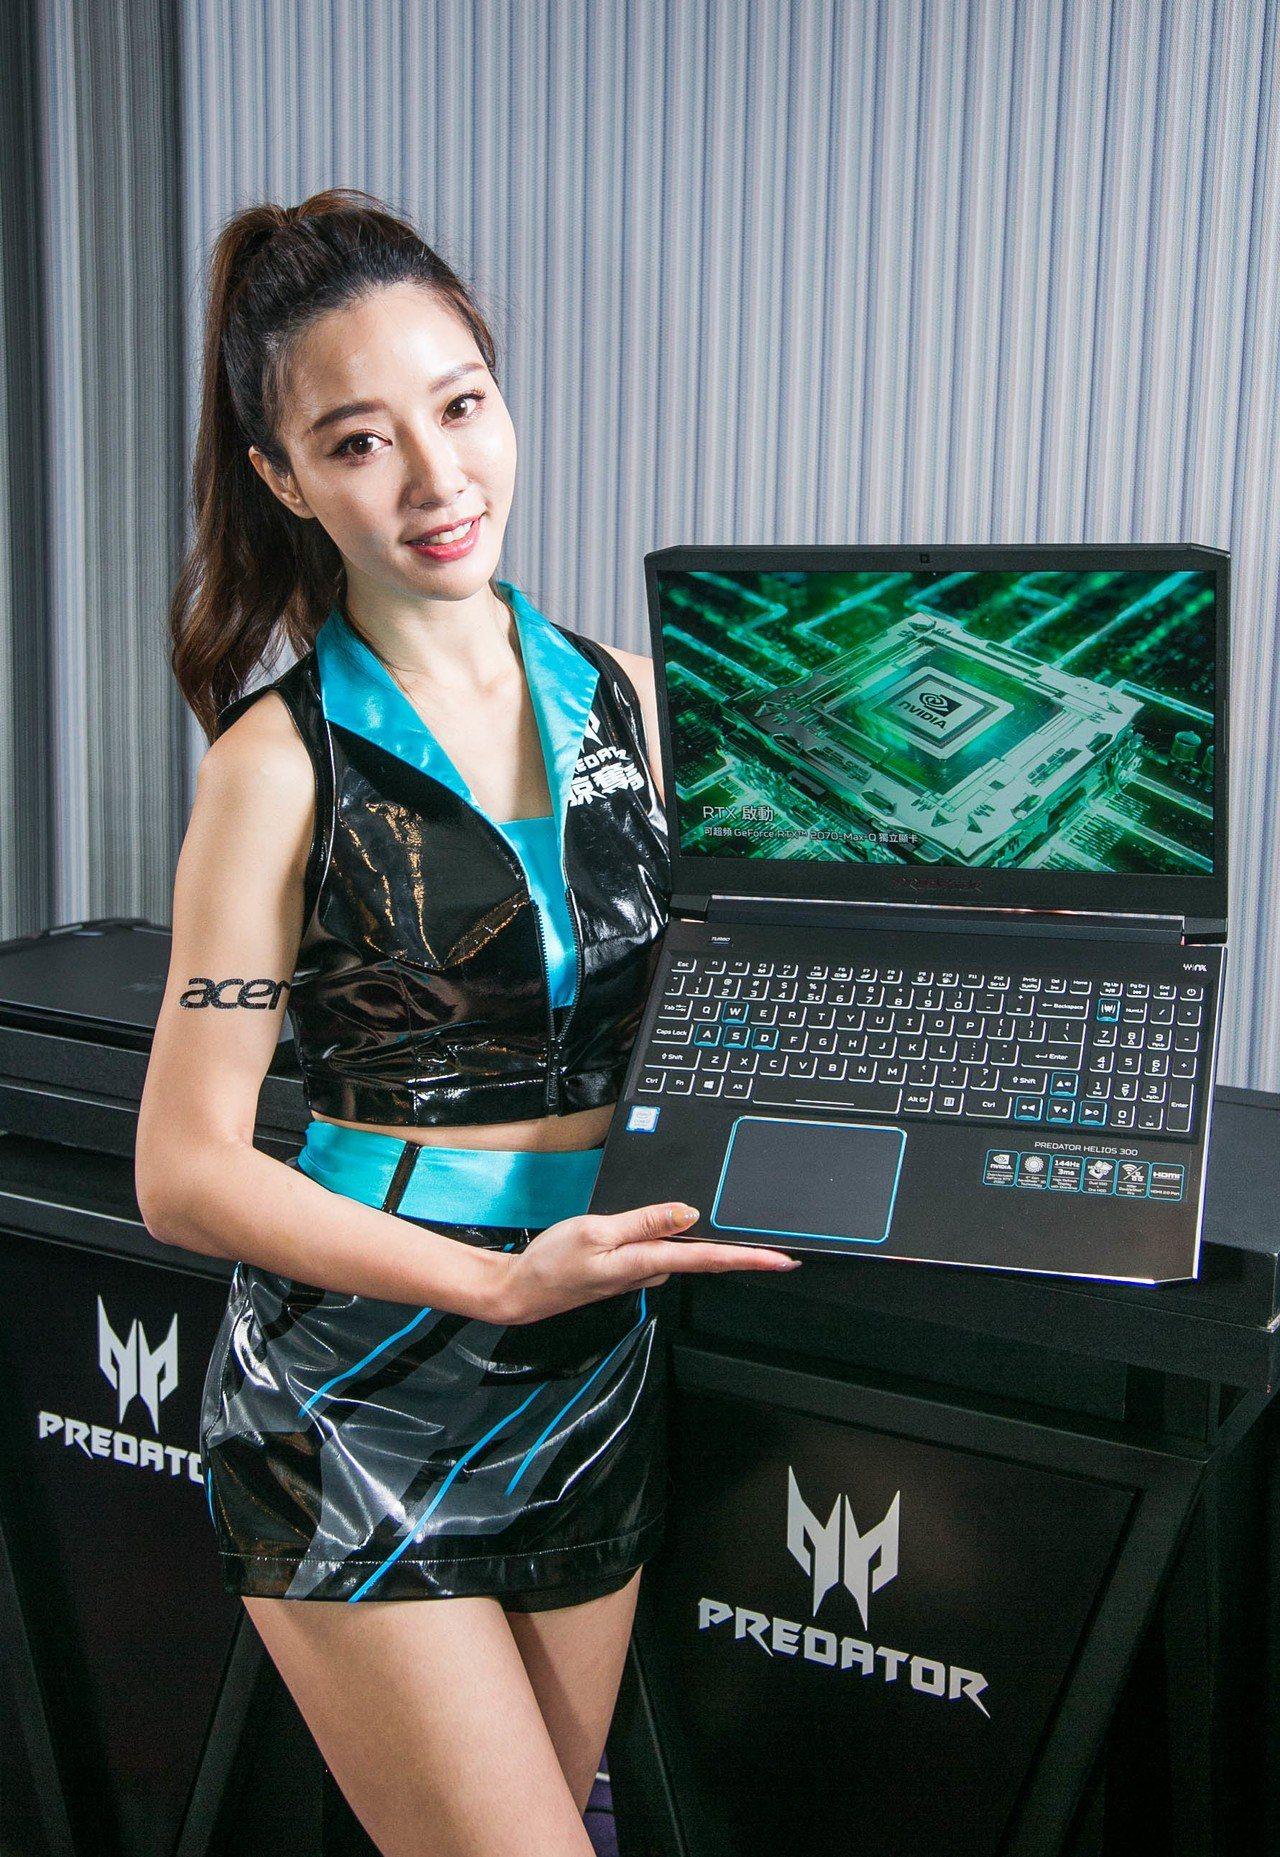 Predator Helios 300電競筆電,15.6吋或17.3吋兩種尺寸建...